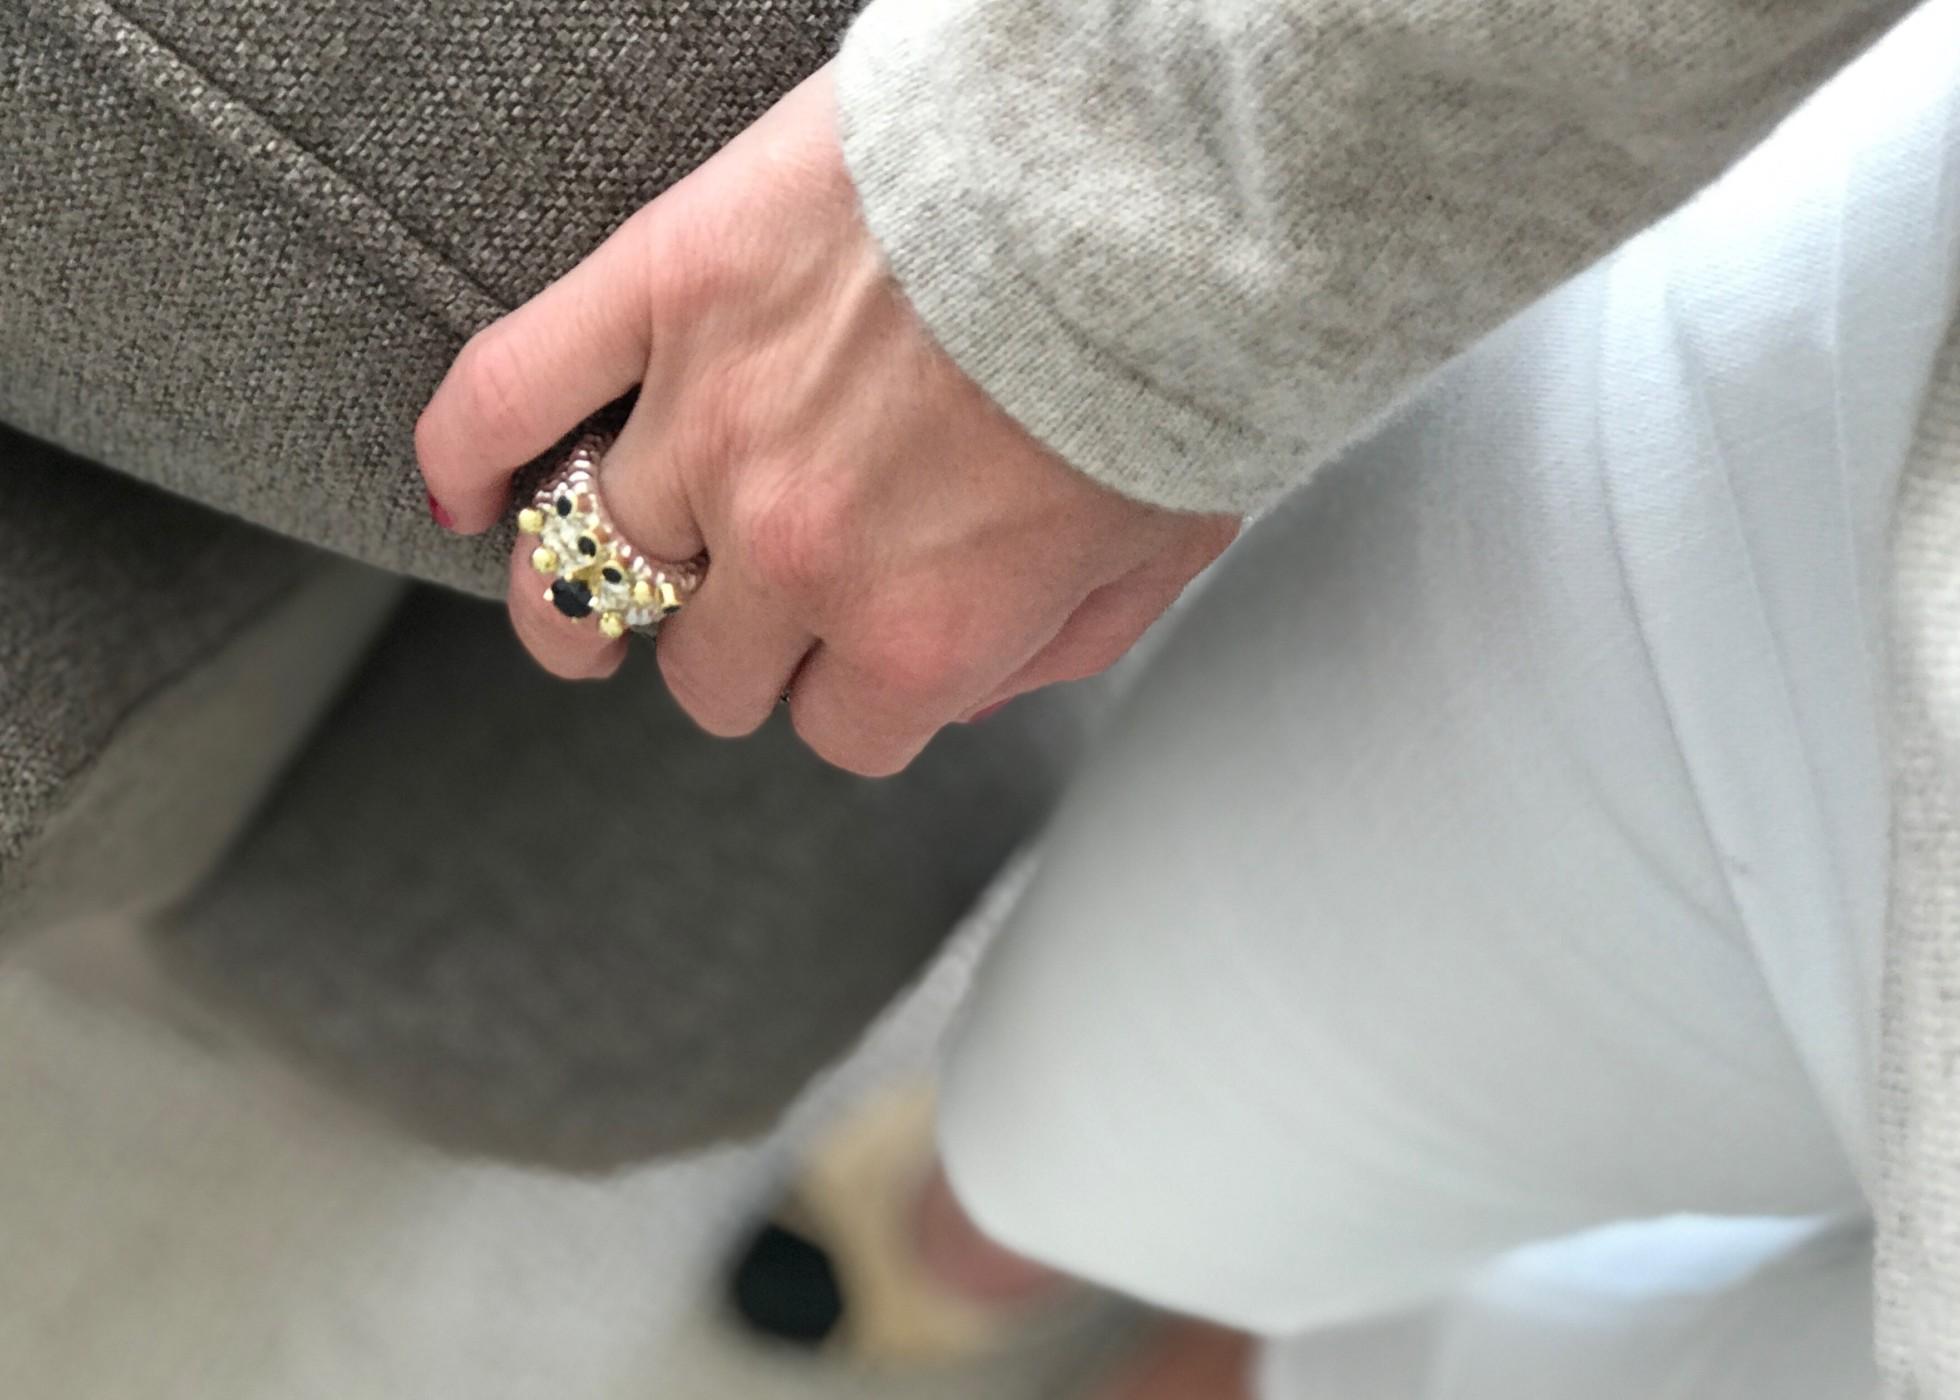 designa ditt egna smycke